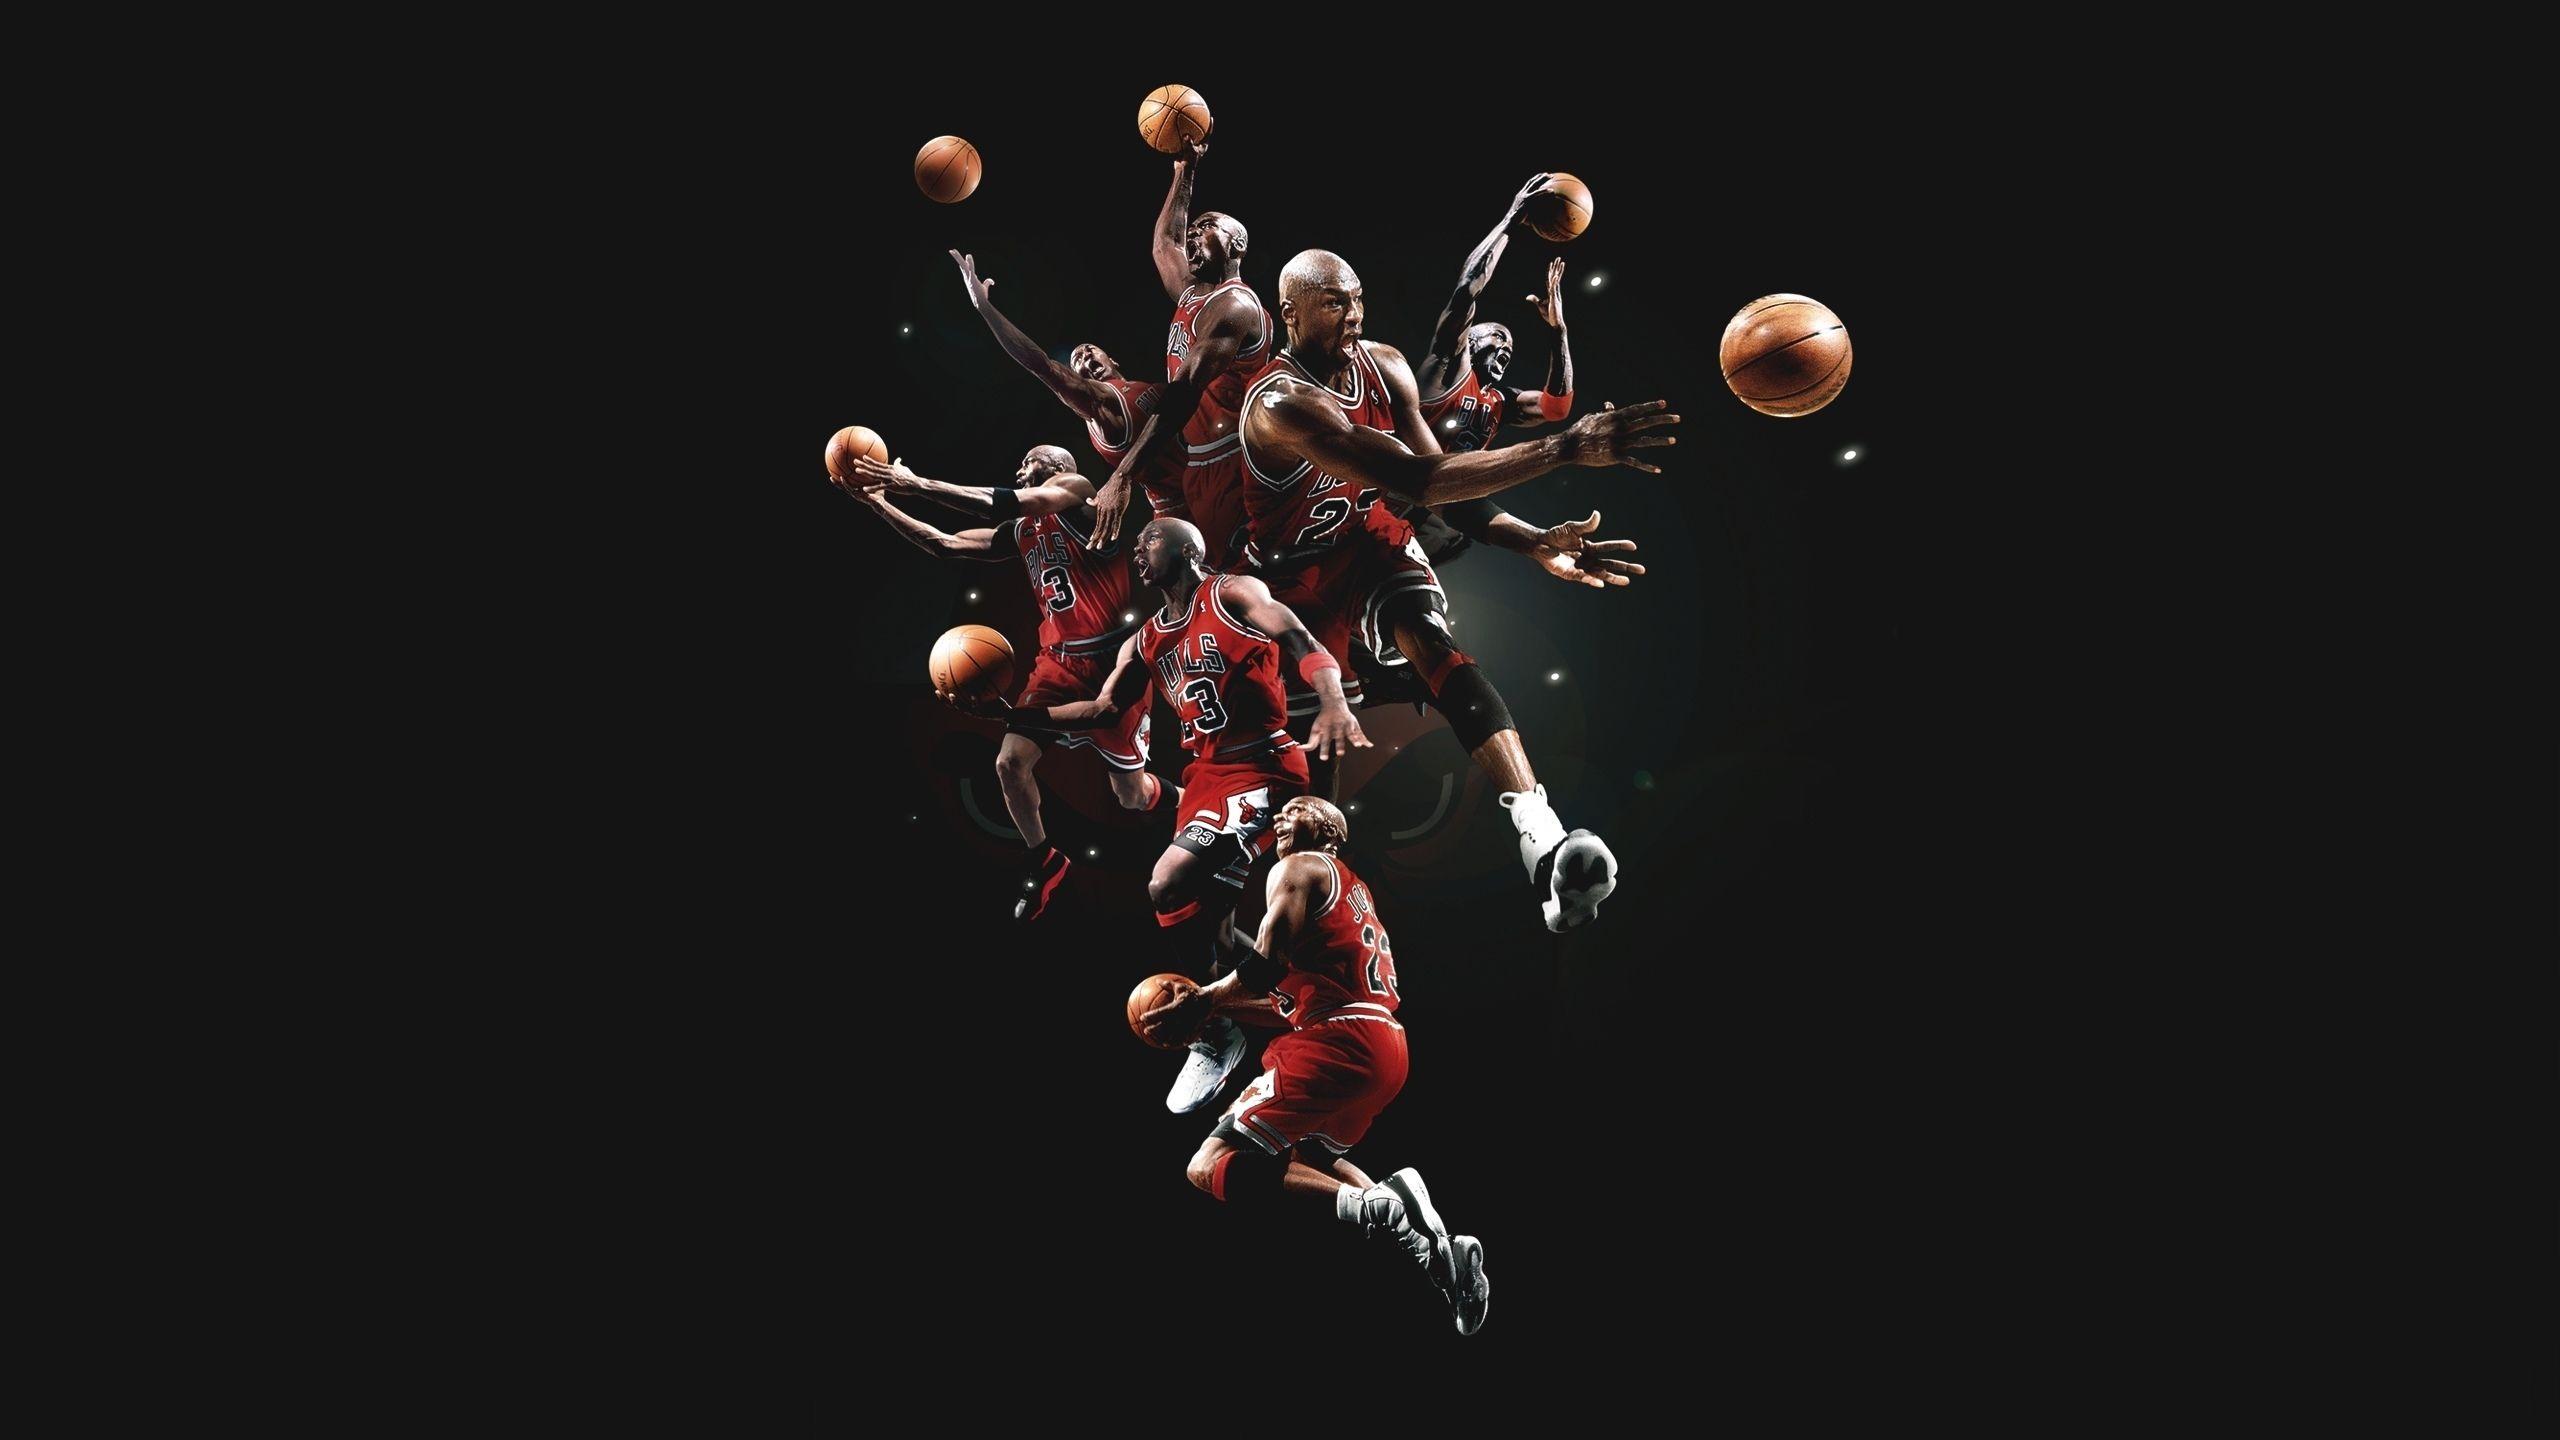 Michael Jordan Basketball Chicago Bulls Men Males Action Stop Motion Wallpaper